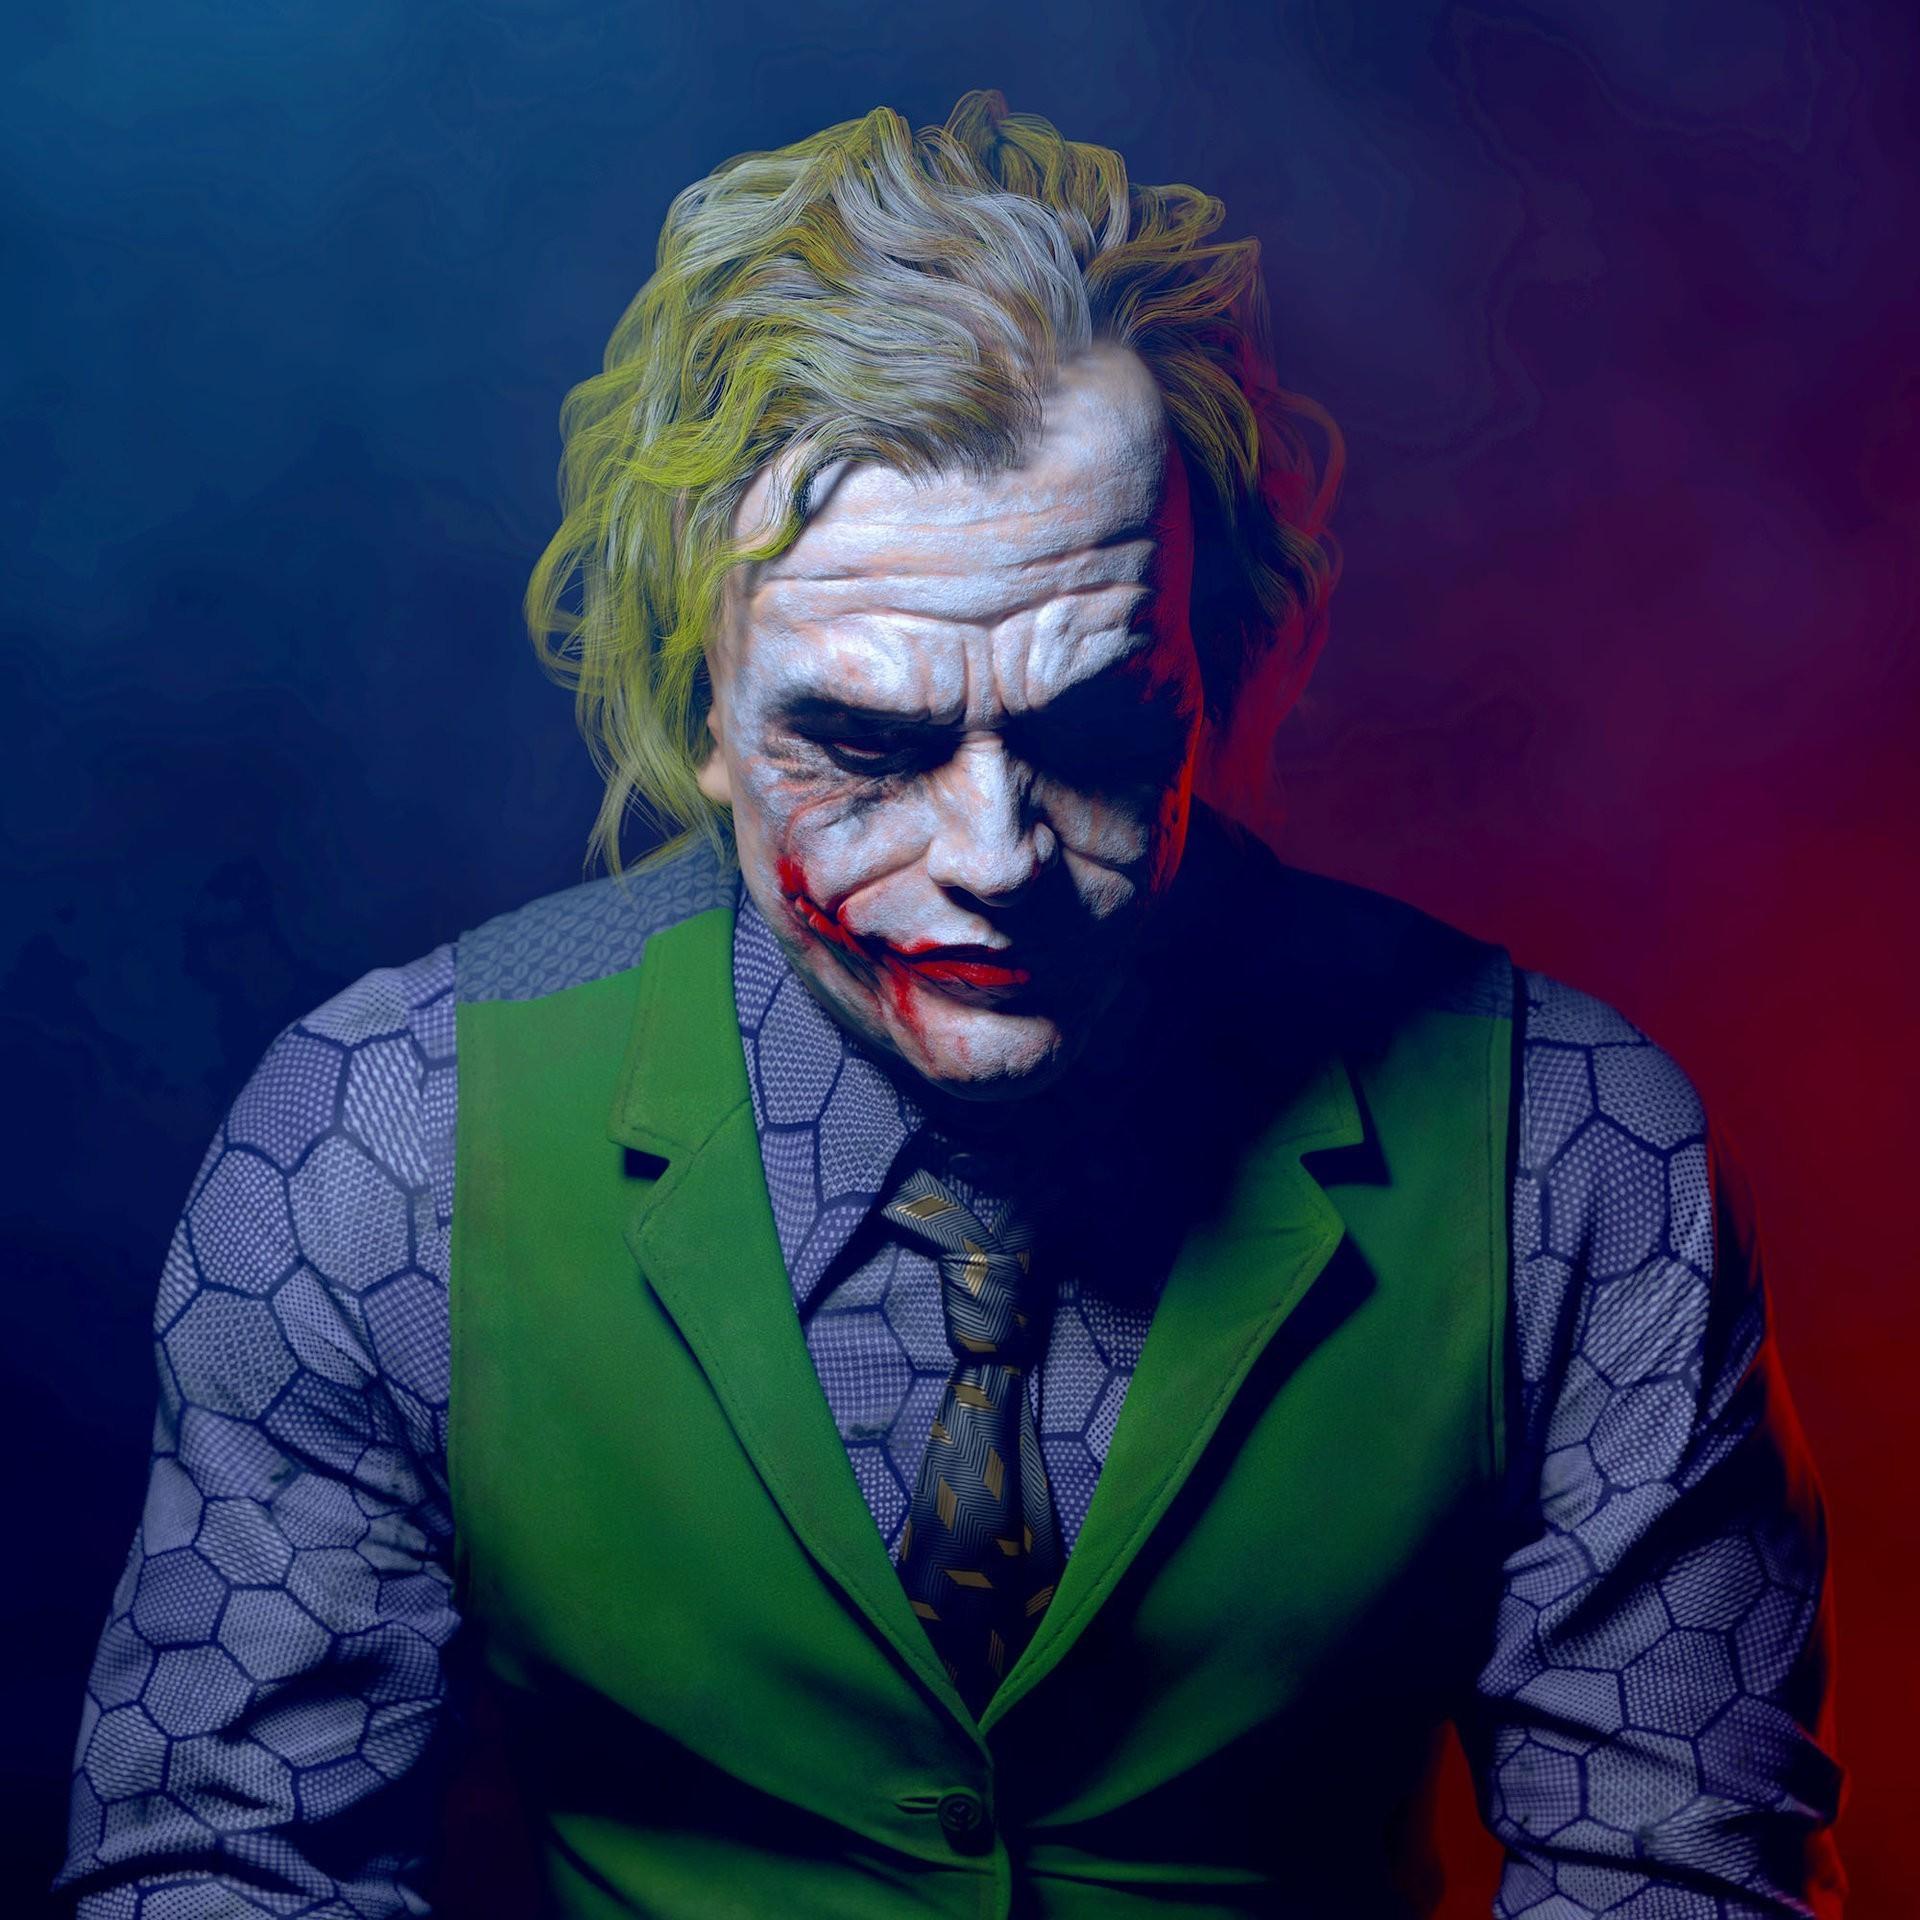 Heath Ledger Joker Wallpaper 1024x768 Wallpapertag